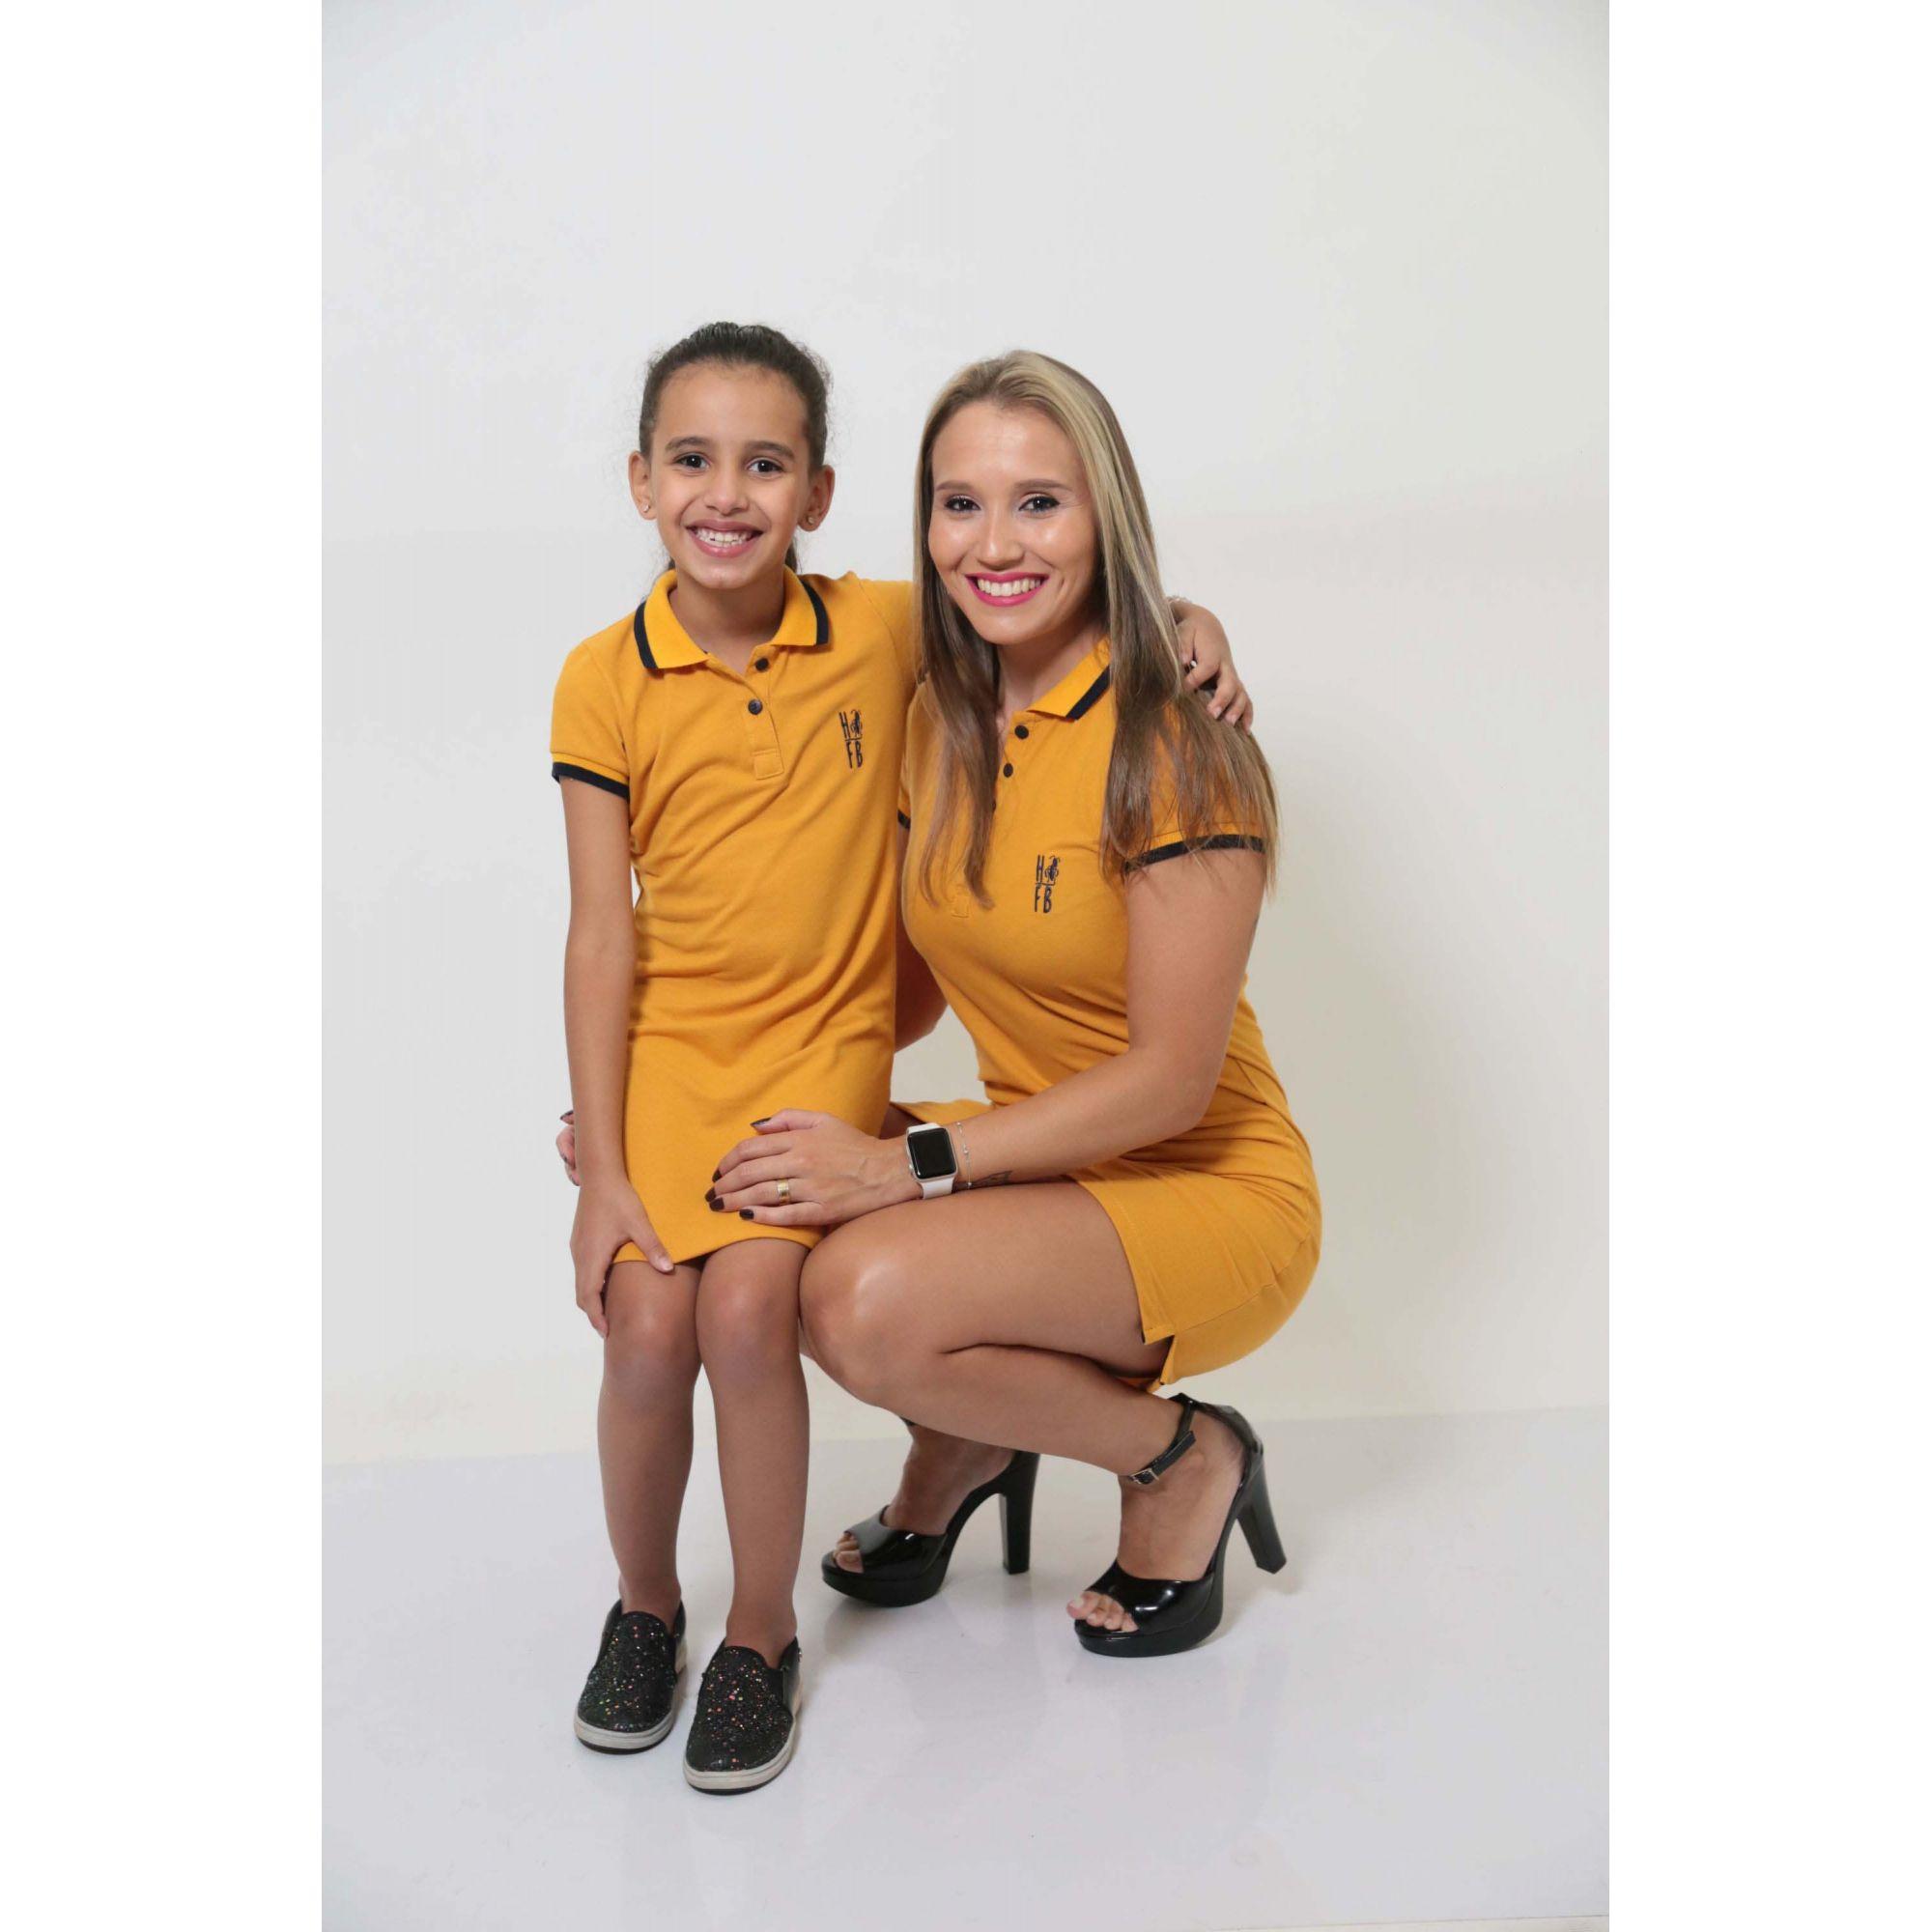 MÃE E FILHA > Kit 02 Vestidos Adulto e Infantil Mostarda [Coleção Tal Mãe Tal Filha]  - Heitor Fashion Brazil